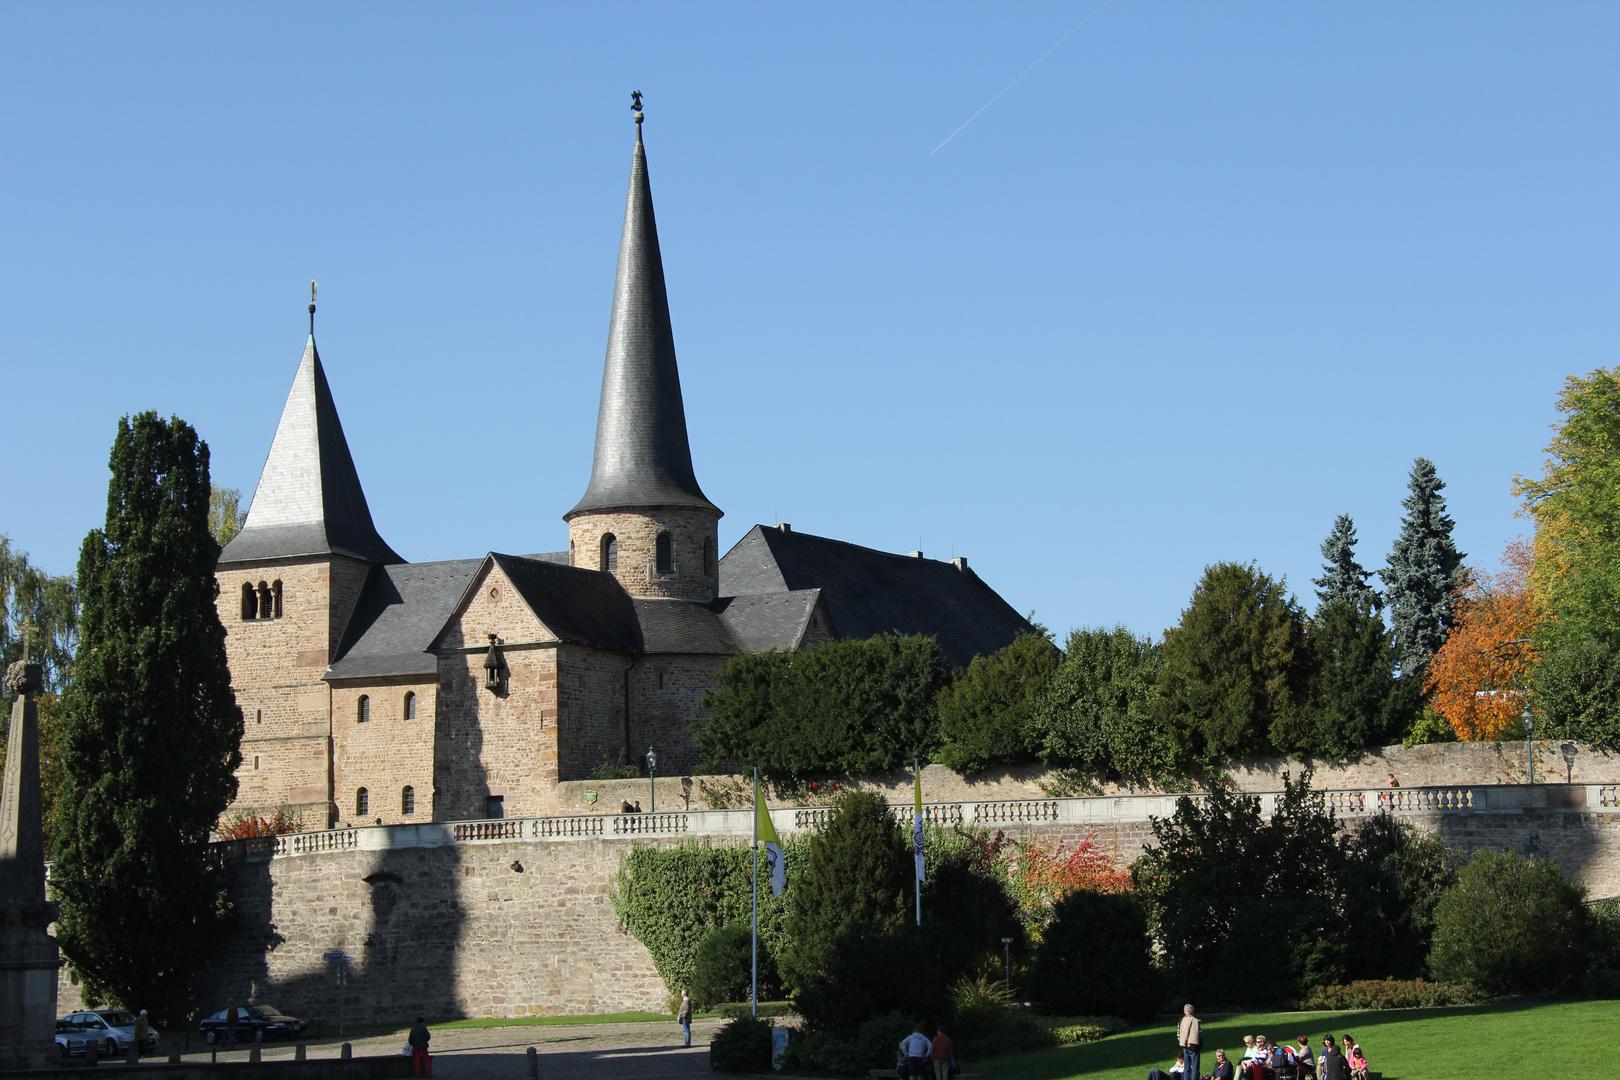 Kloster Fulda